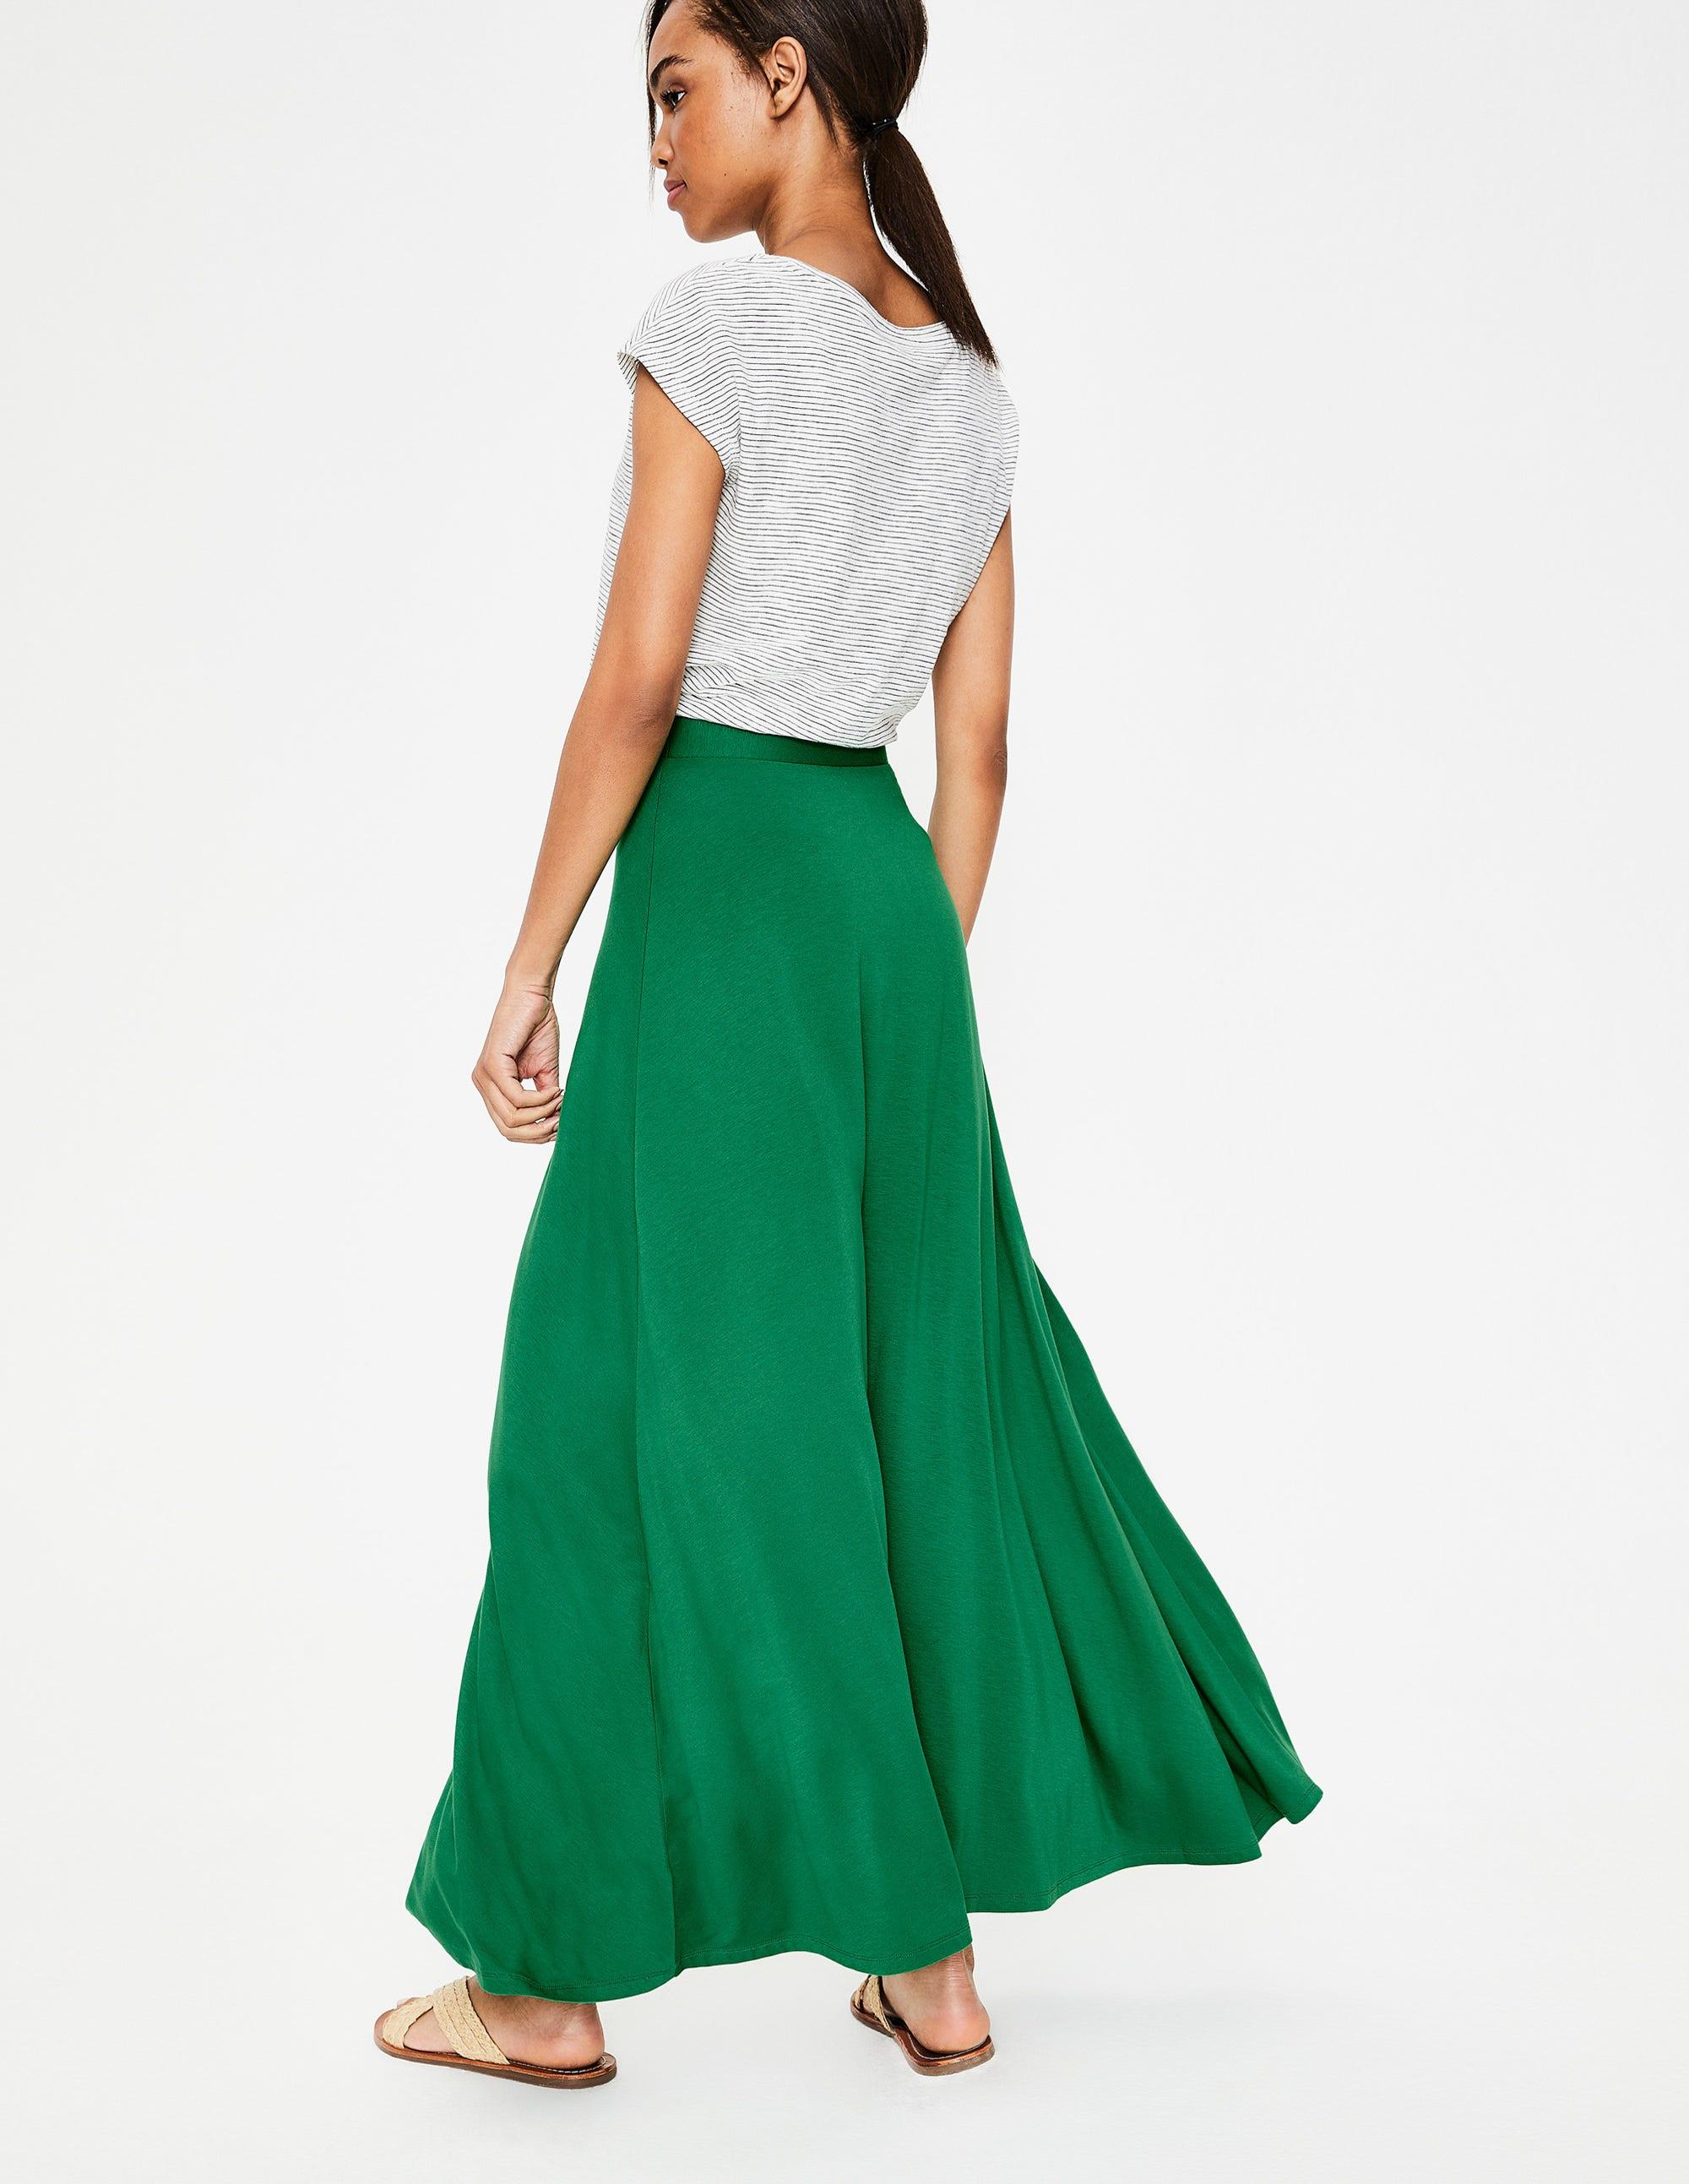 057f1c1f3 Albany Jersey Maxi Skirt - Black | Boden UK